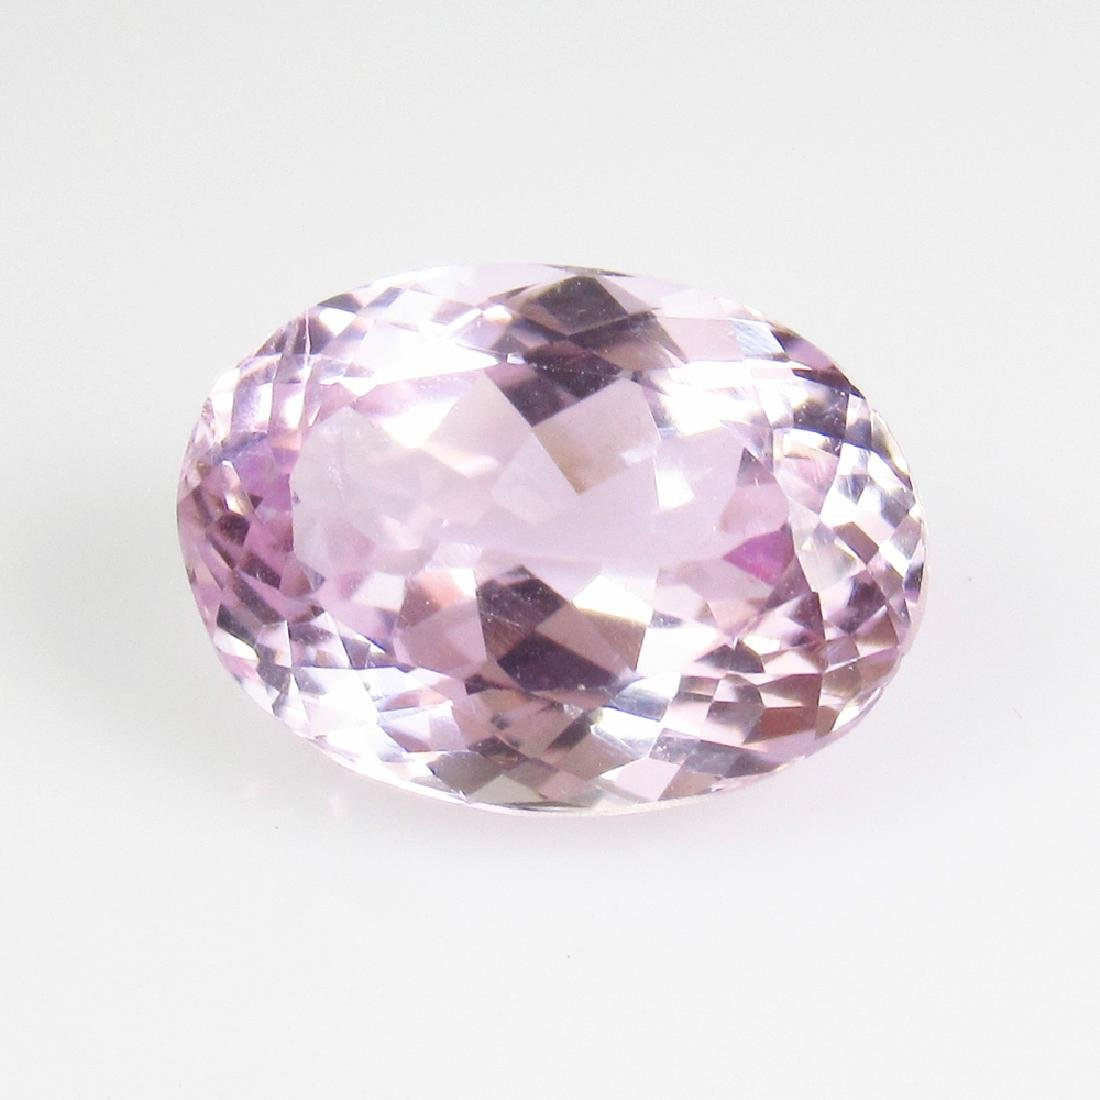 7.03 Ct Genuine Sweet Pink Kunzite Oval Cut